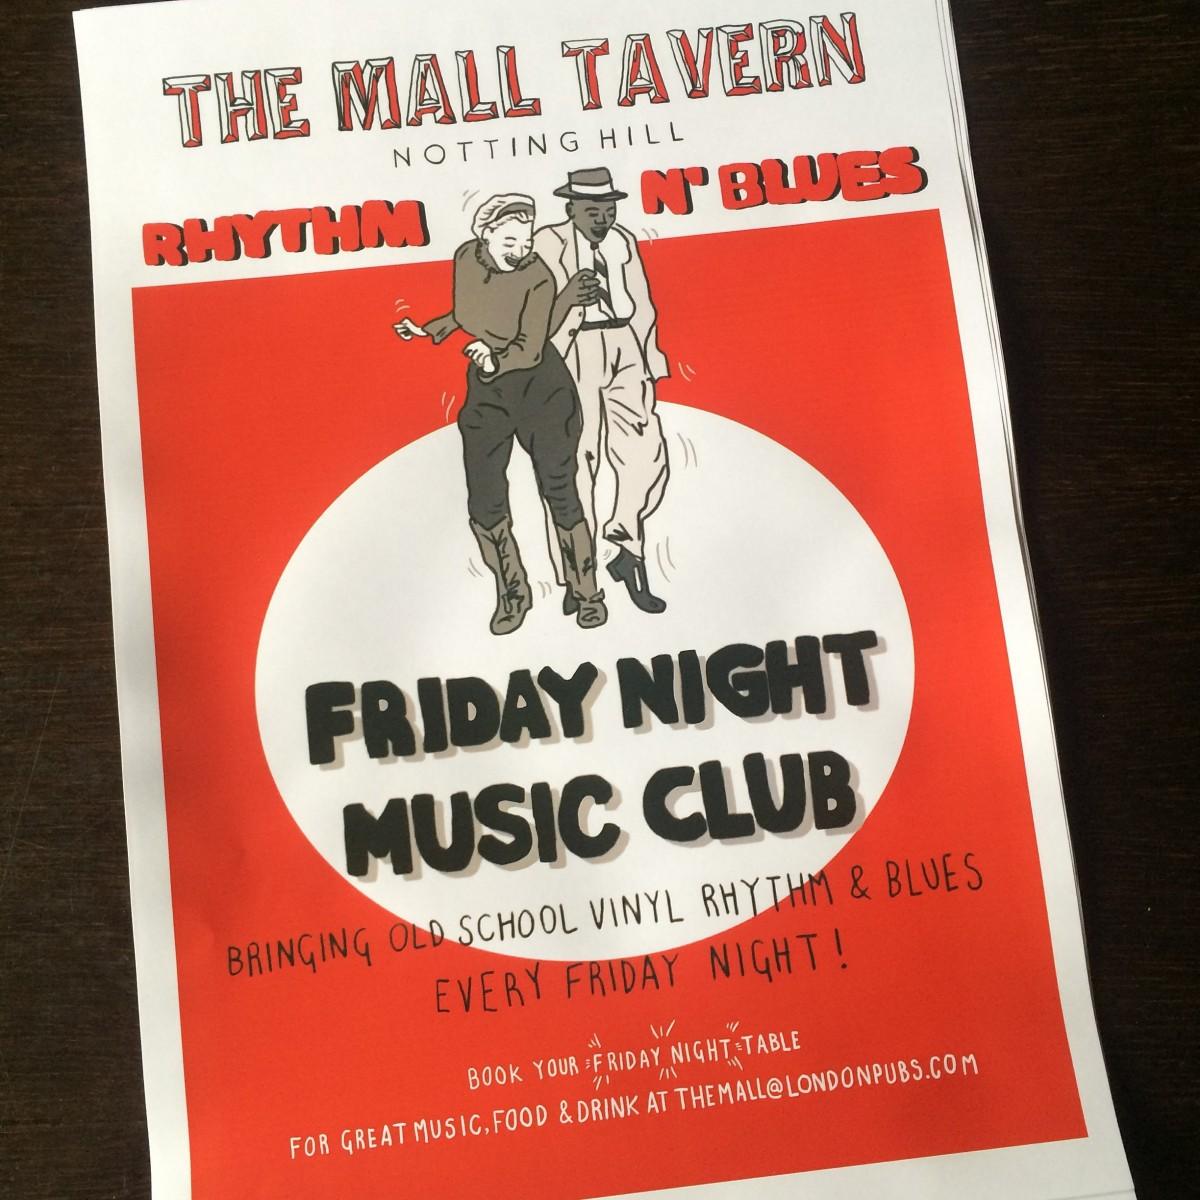 Friday night music club the mall tavern london designmynight for 71 73 palace gardens terrace notting hill london w8 4ru